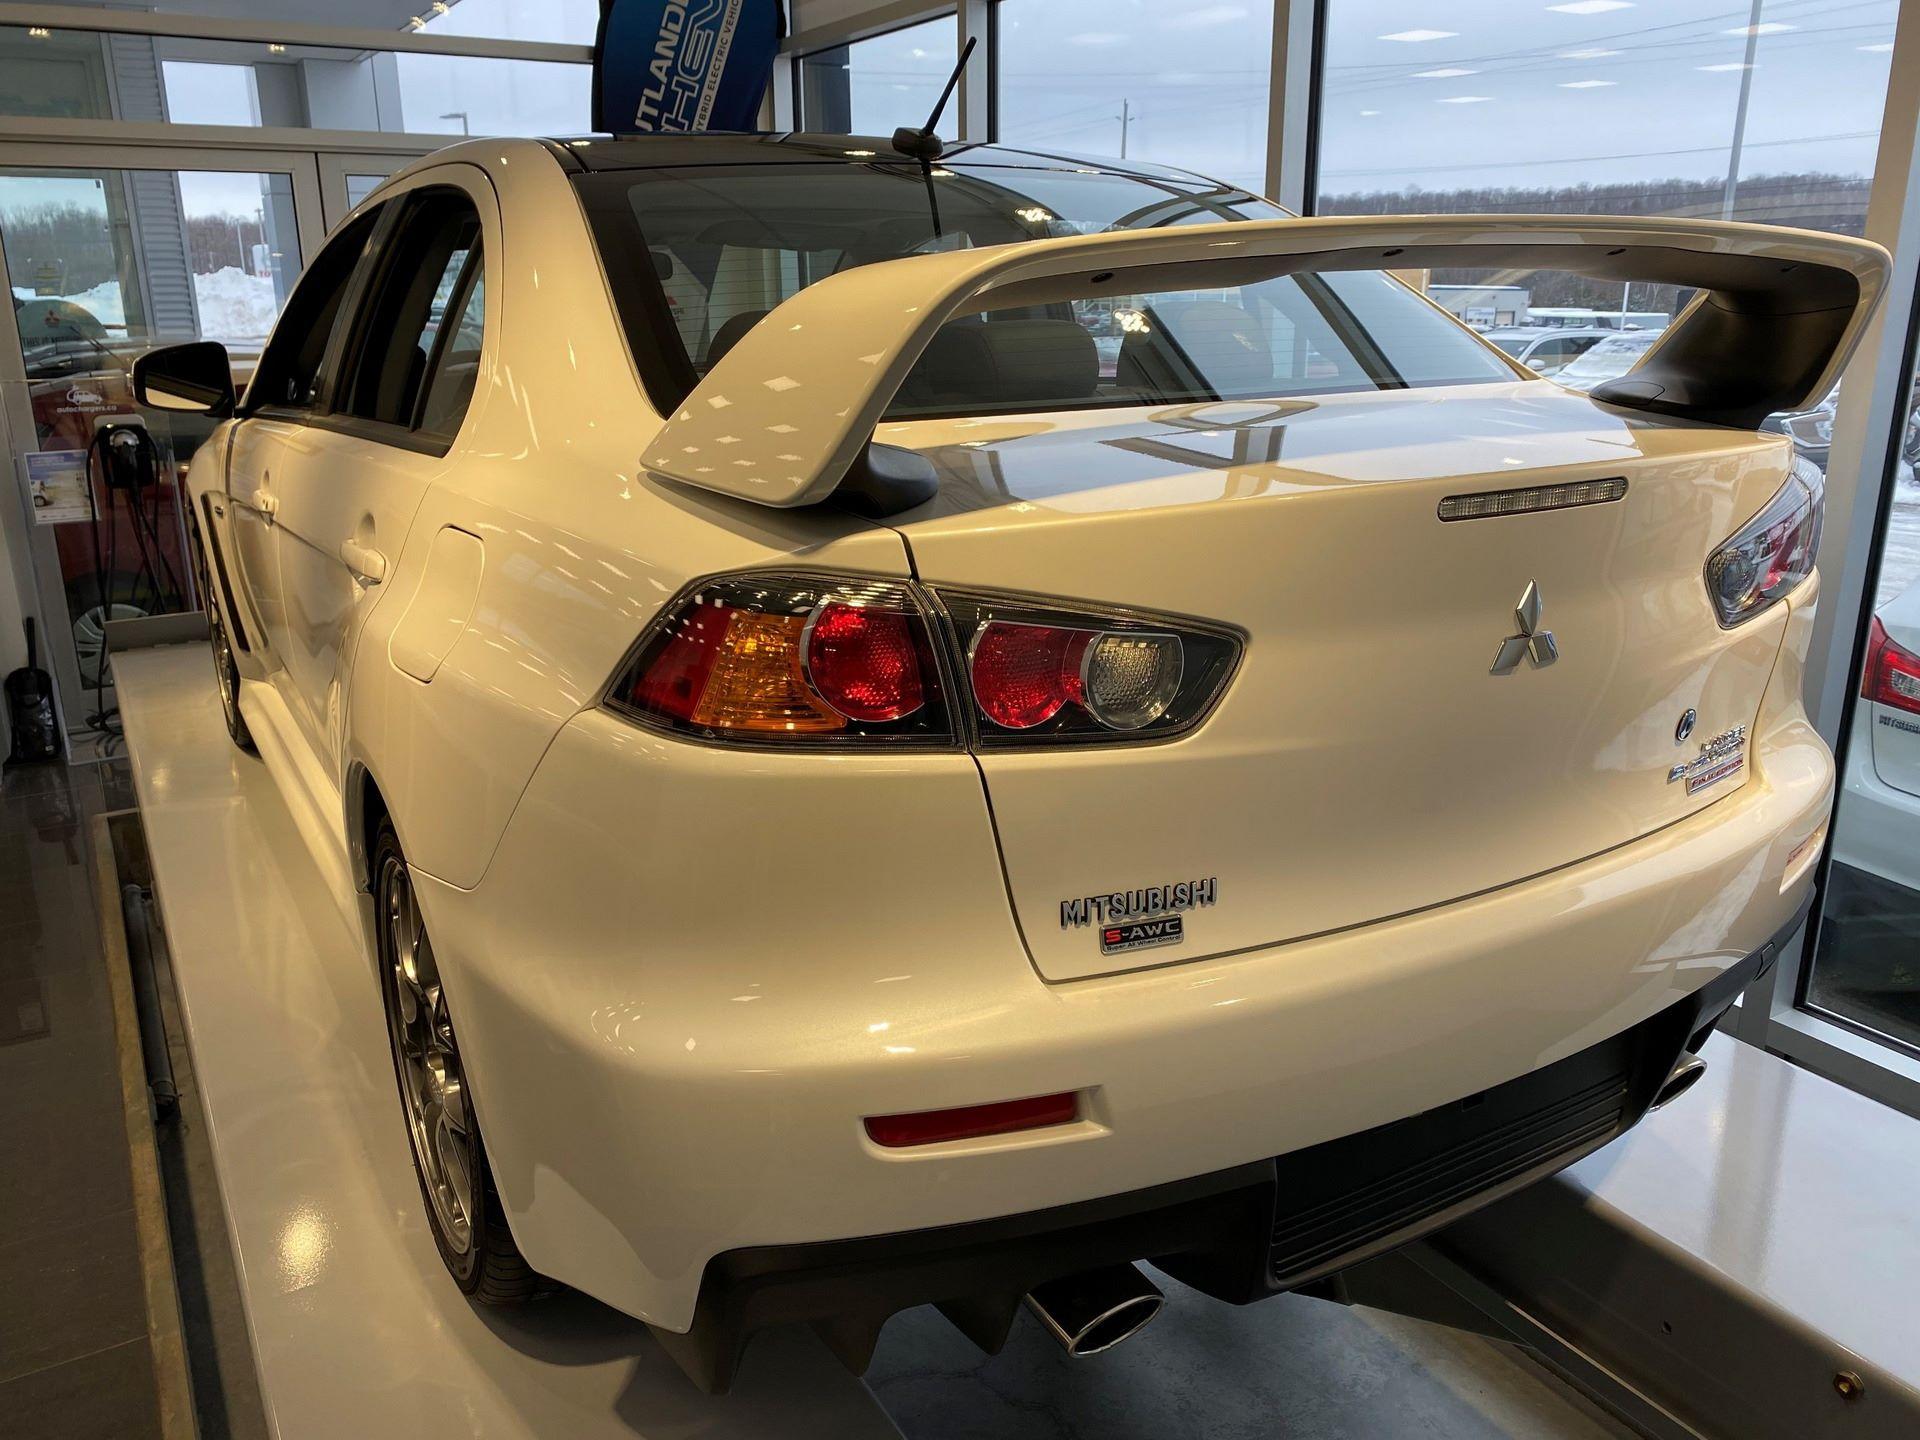 Mitsubishi-Lancer-Evo-Final-Edition-for-sale-9